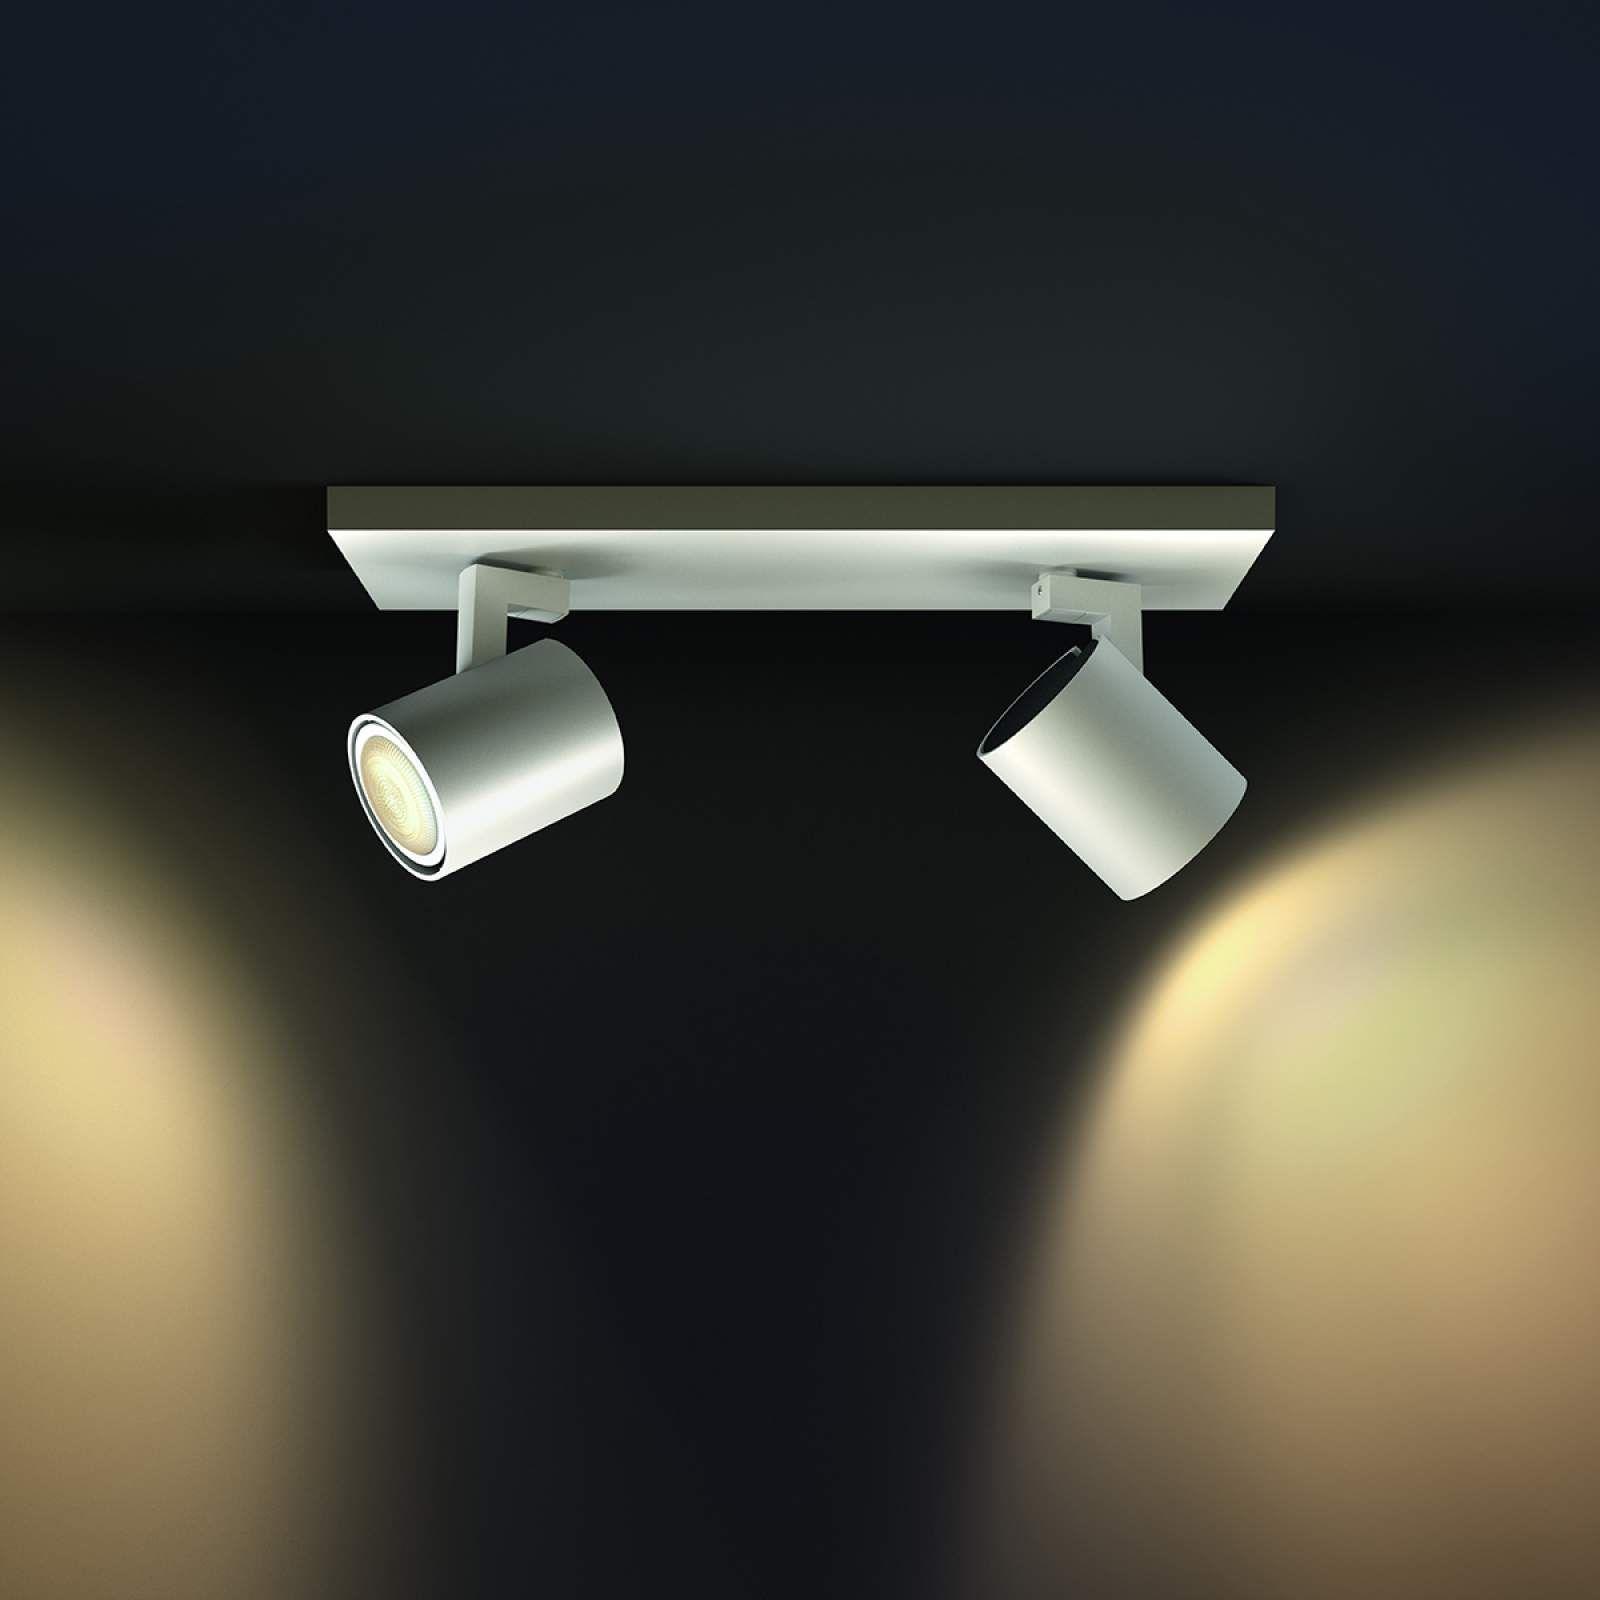 Nachttischlampe Chrom Dimmbare Einbaustrahler Einbau Led Spots 230v Kristall Lampenol Pendel Lampe Hvid Glas Wandbeleuchtung Einbau Led Wandlampen